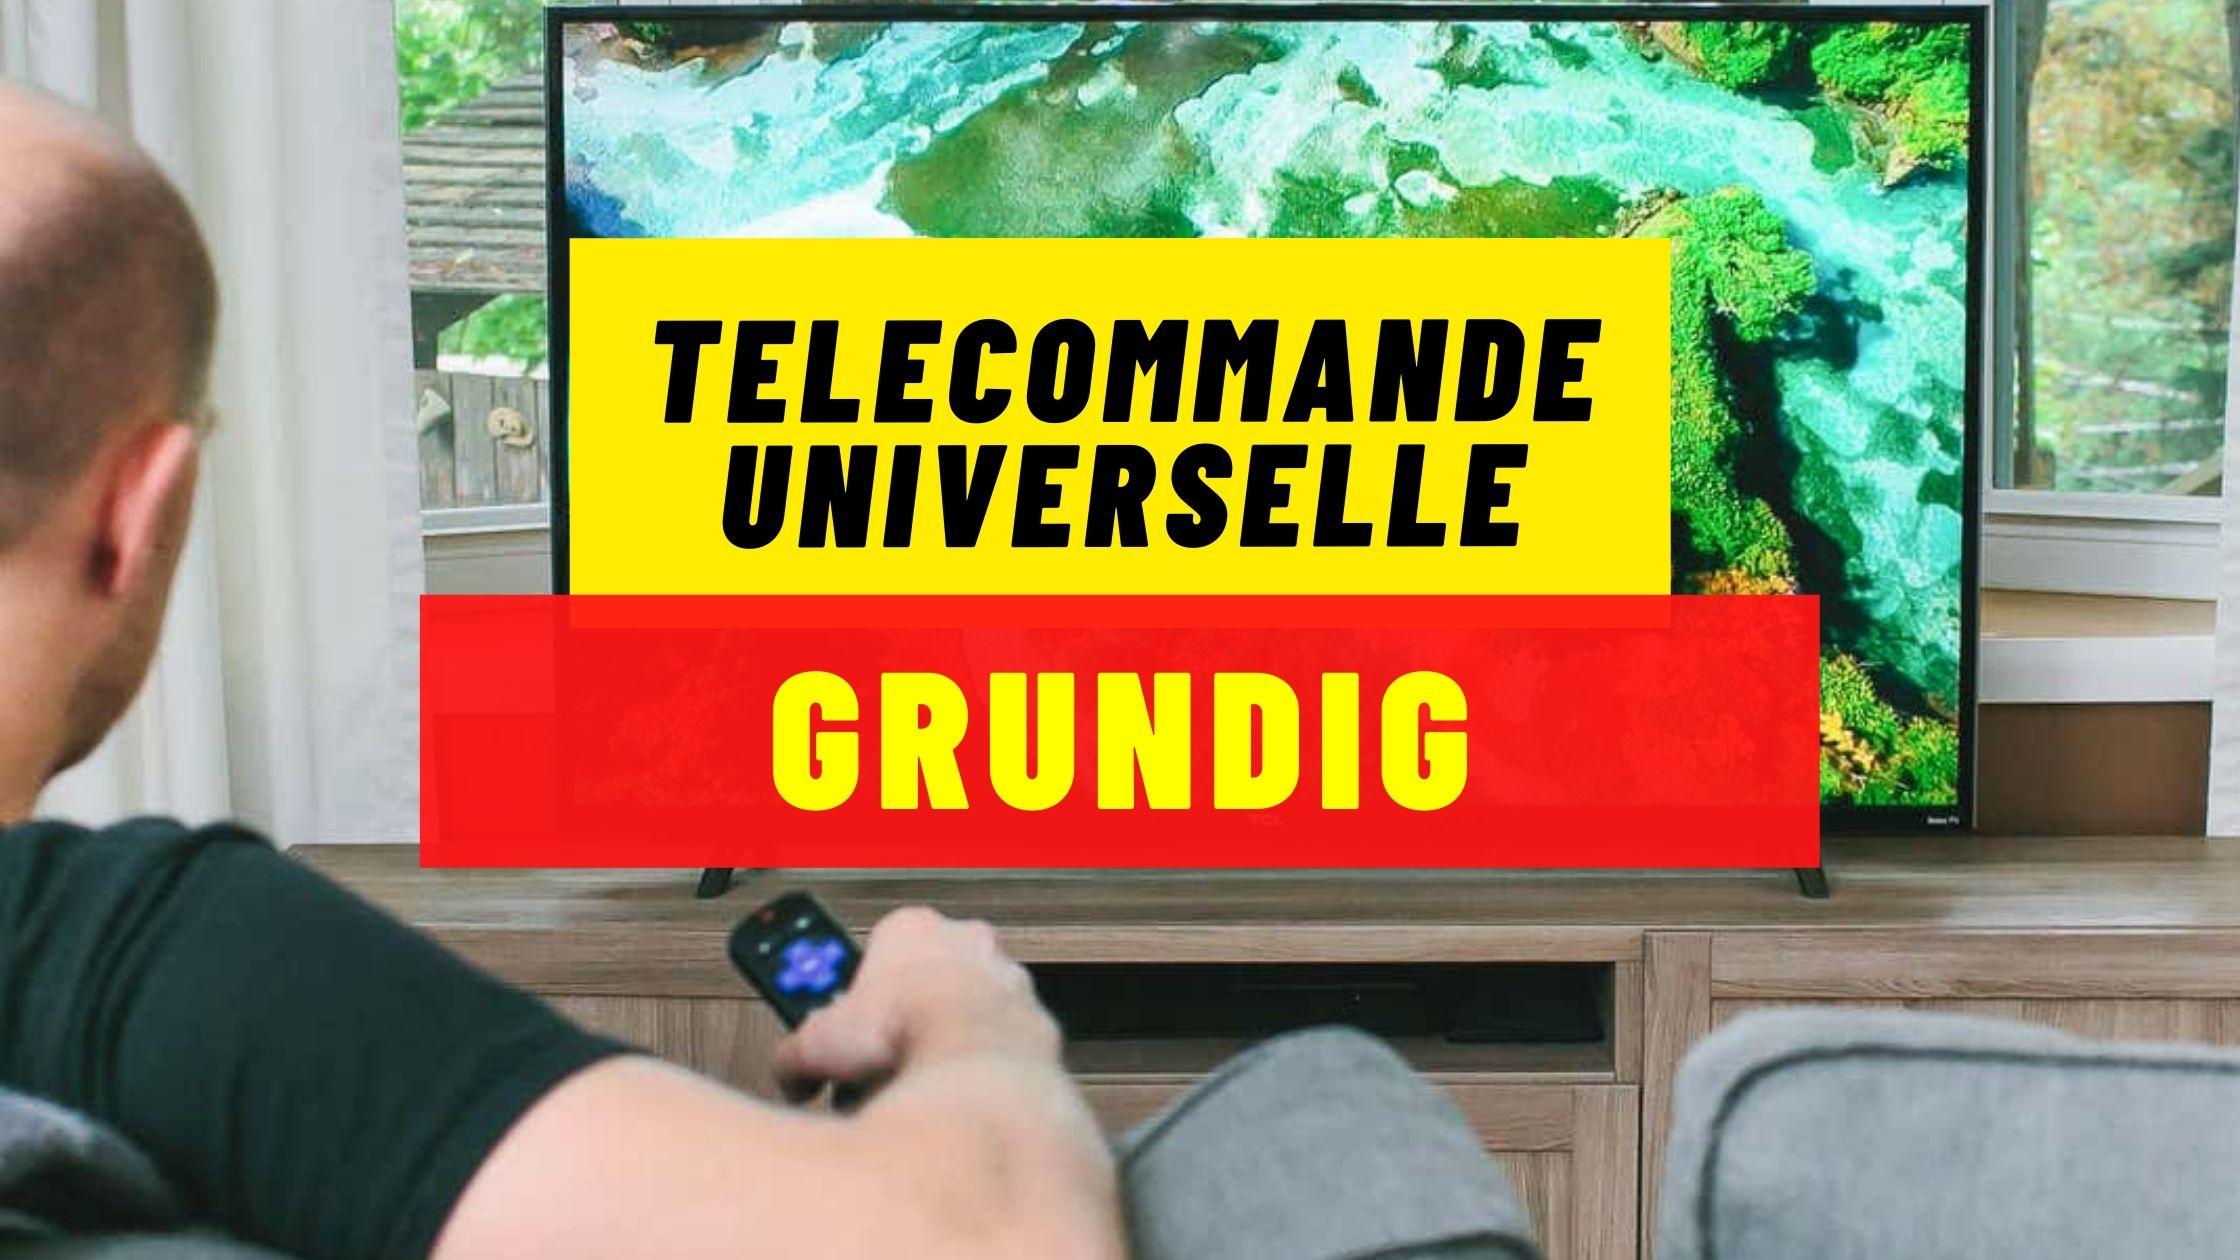 telecommande universelle grunding 1